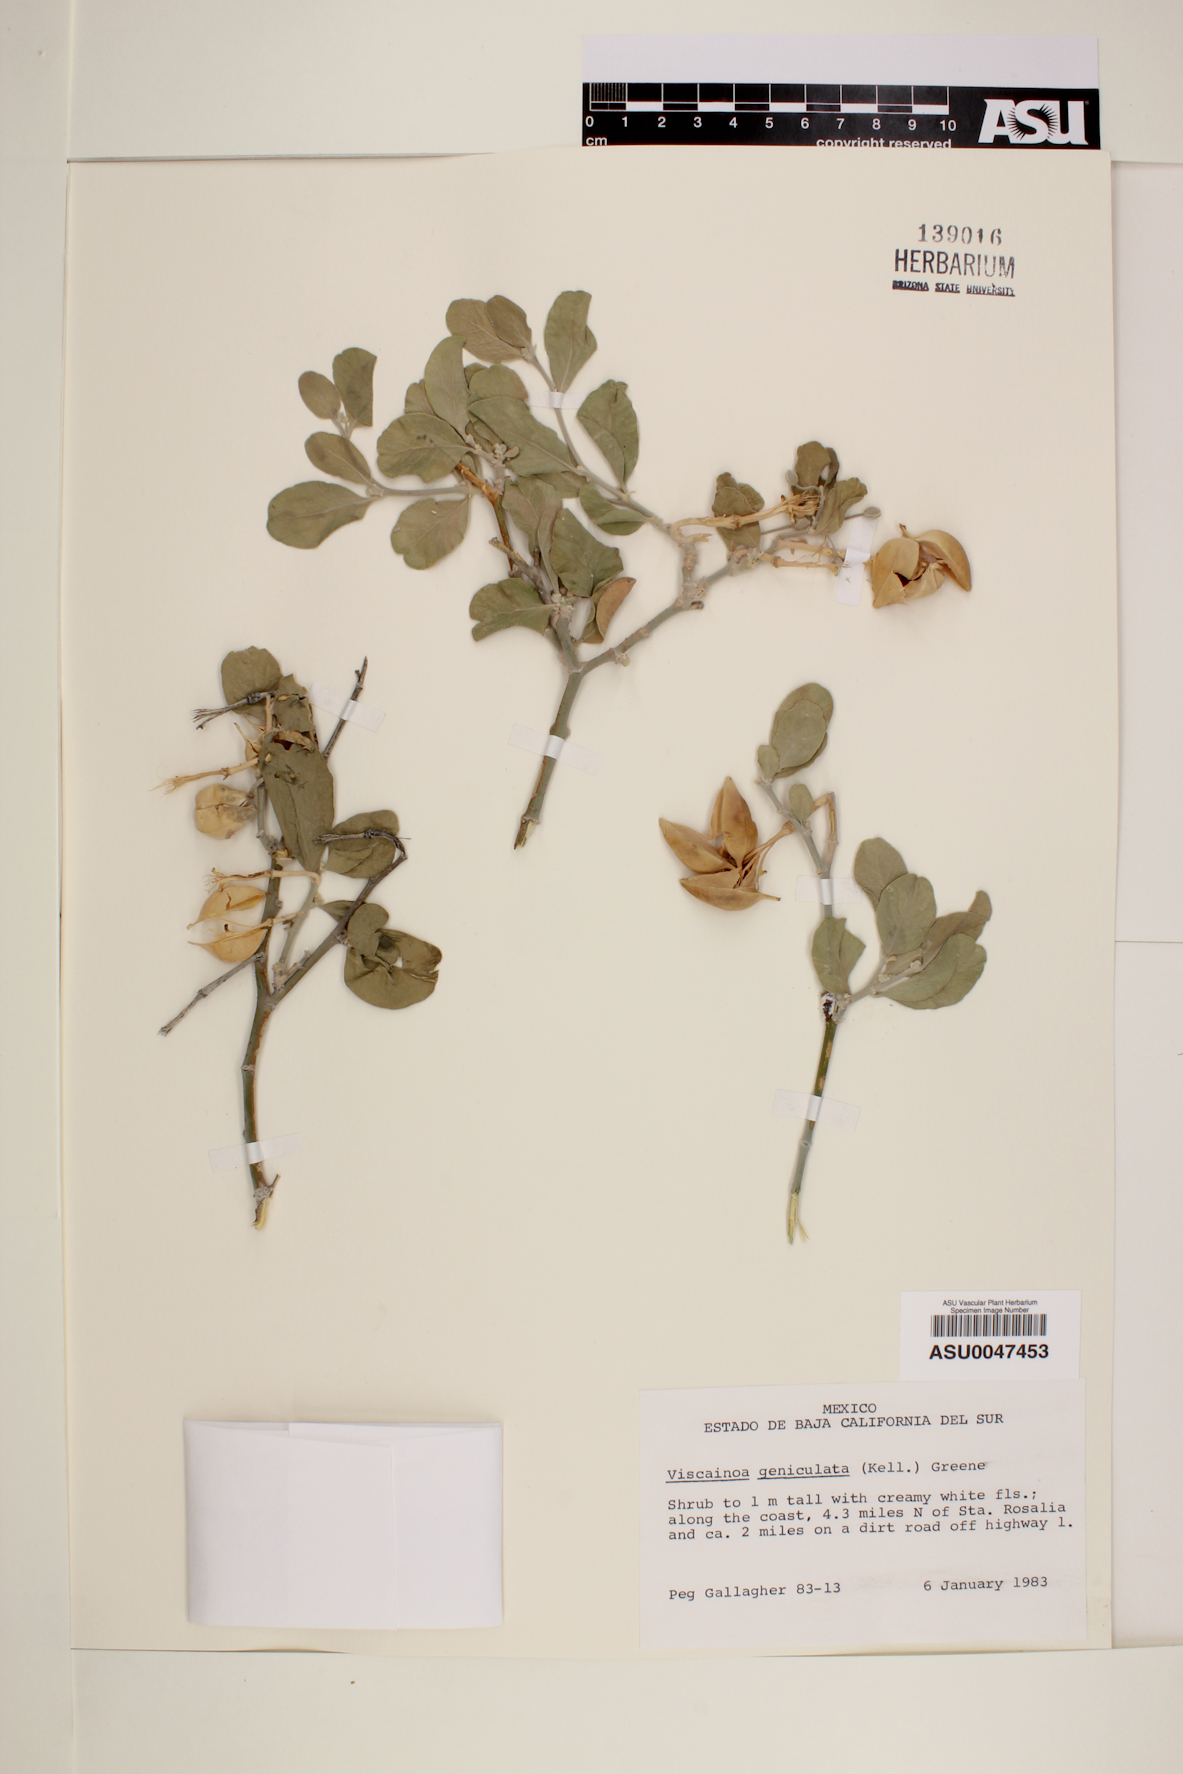 Viscainoa geniculata image